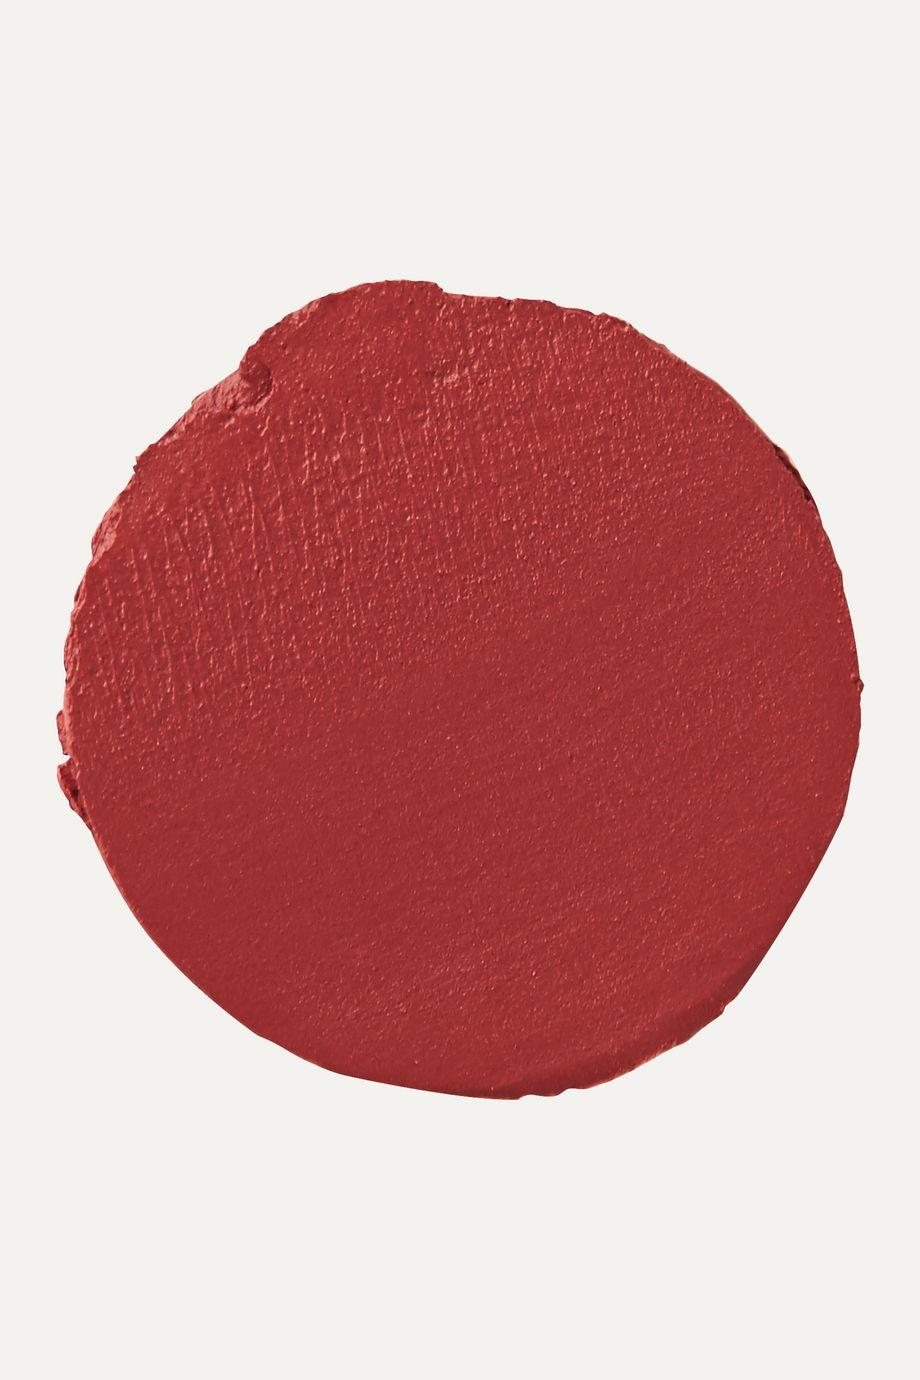 Pat McGrath Labs Lip Fetish Lip Balm - Flesh 3